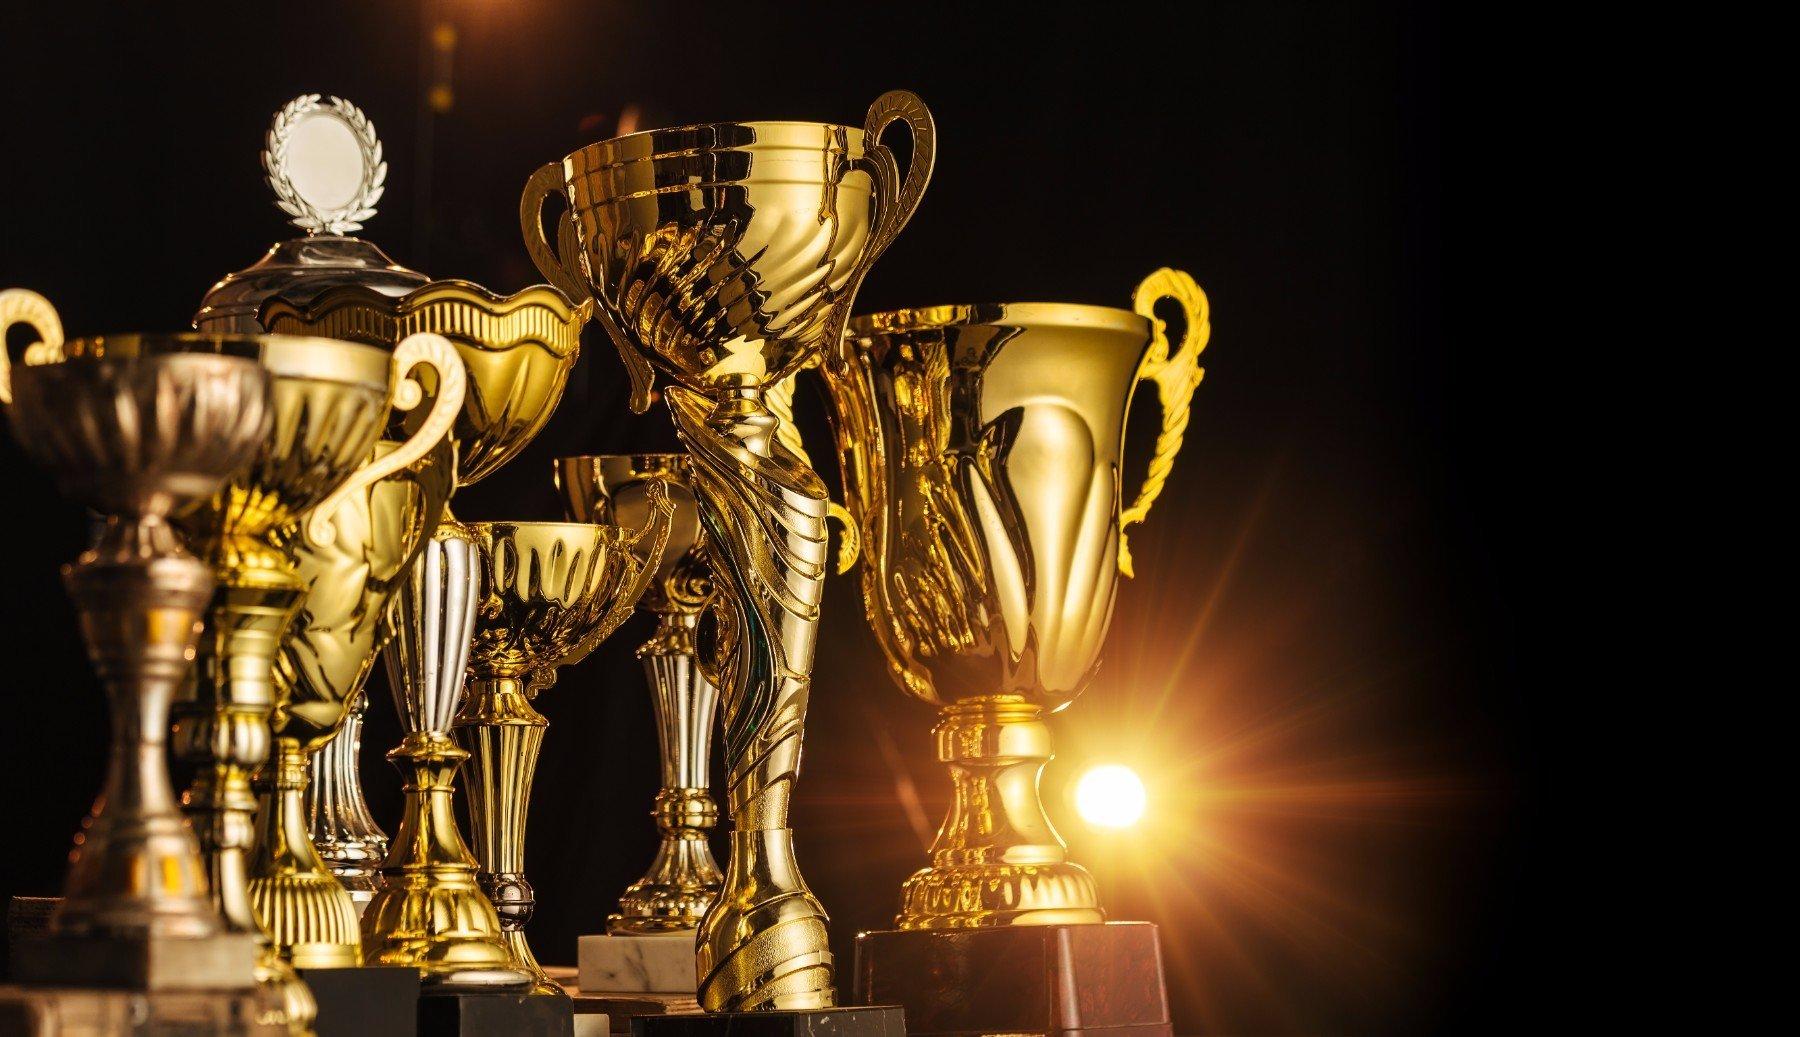 dei trofei dorati